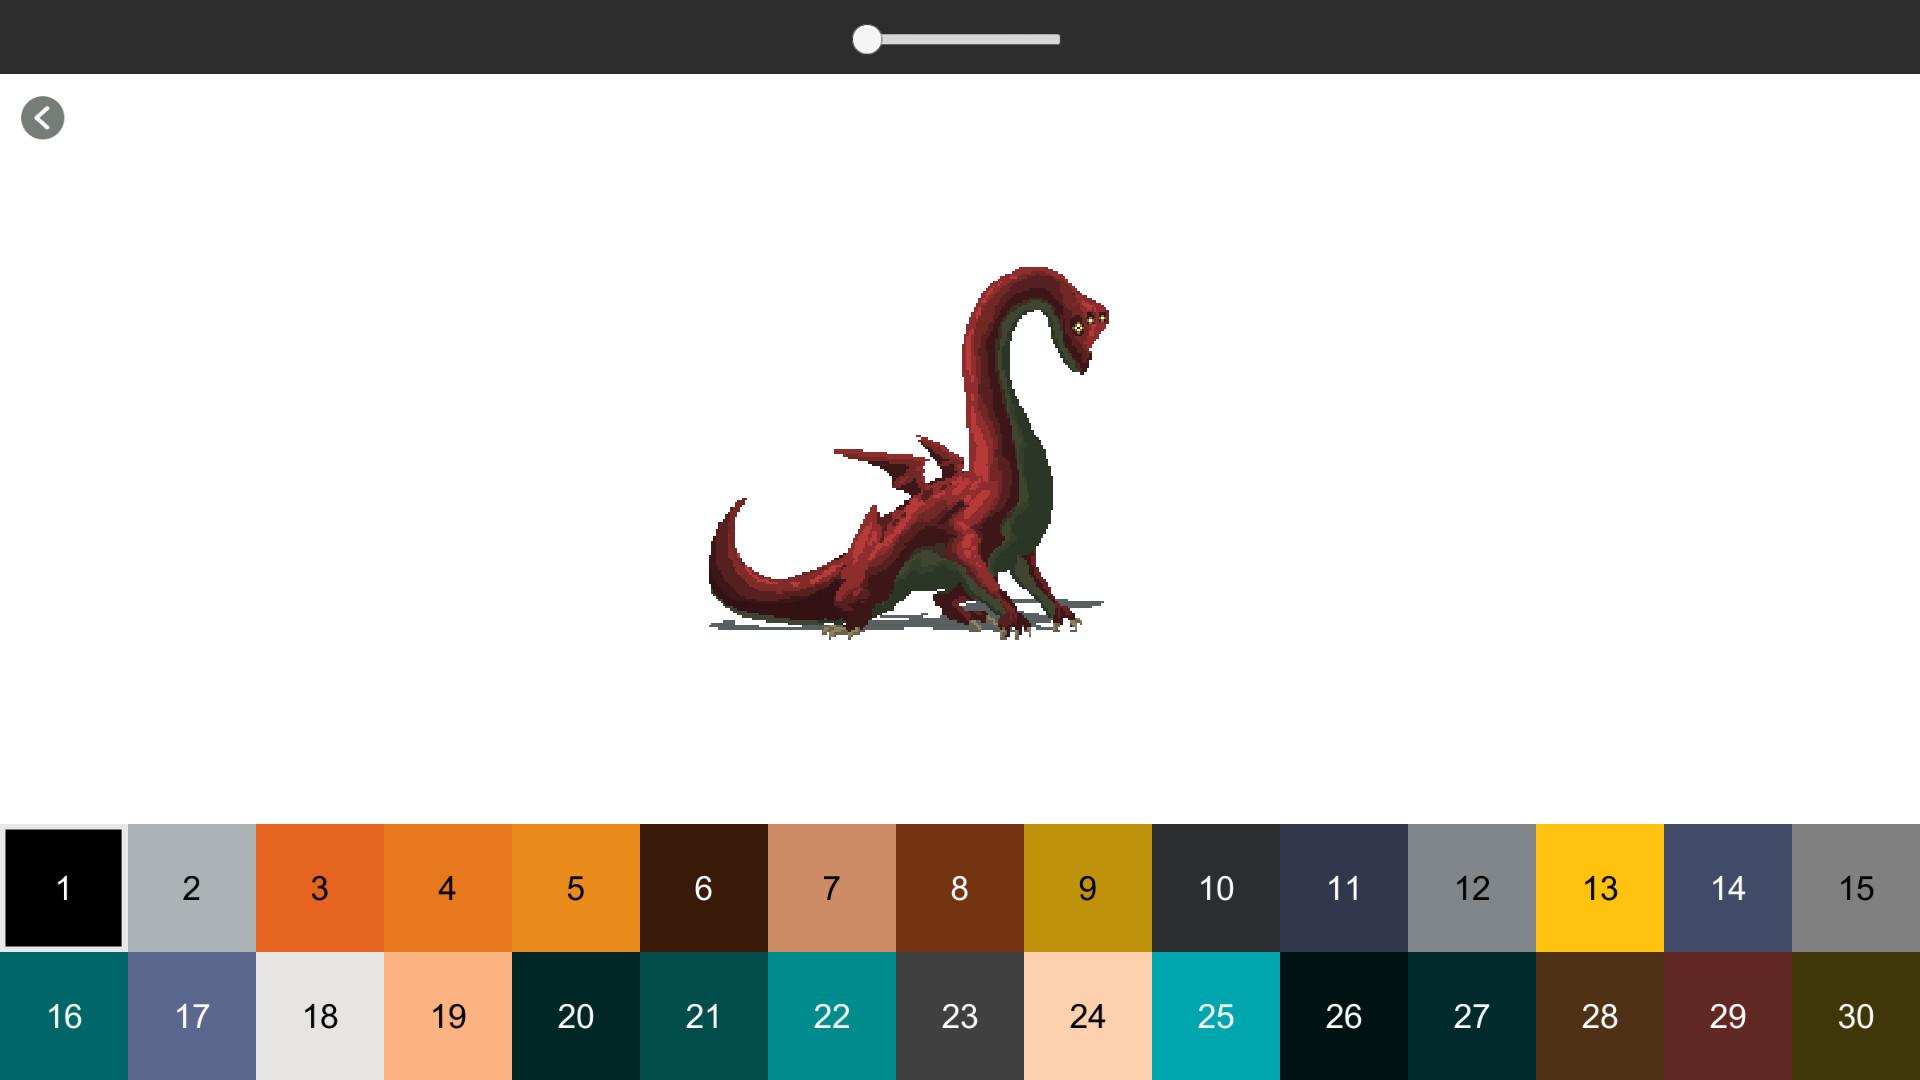 Pixel Art Monster - Expansion Pack 13 screenshot